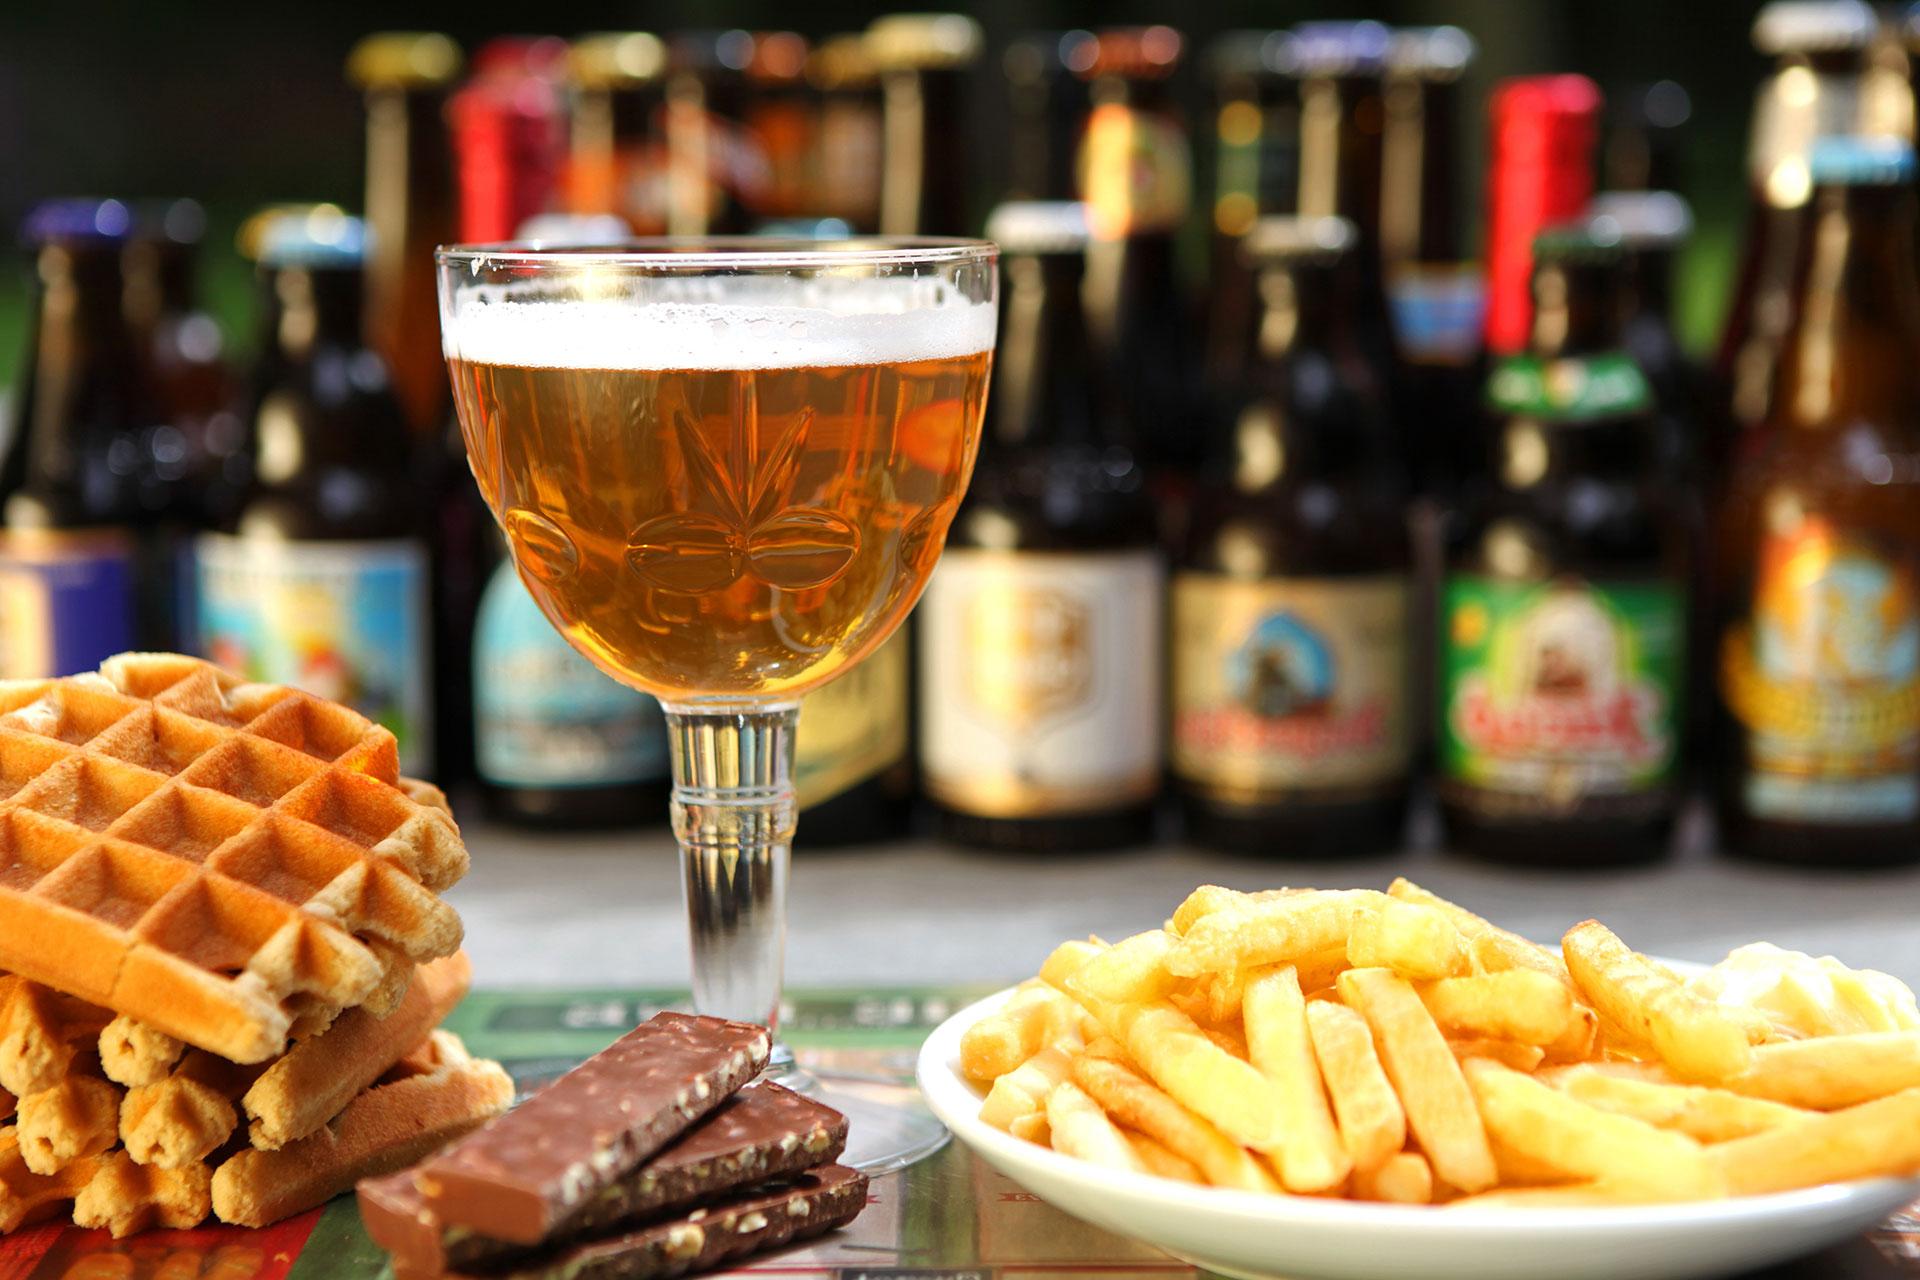 Gastronomische specialiteiten - bier, wafels, chocola en friet